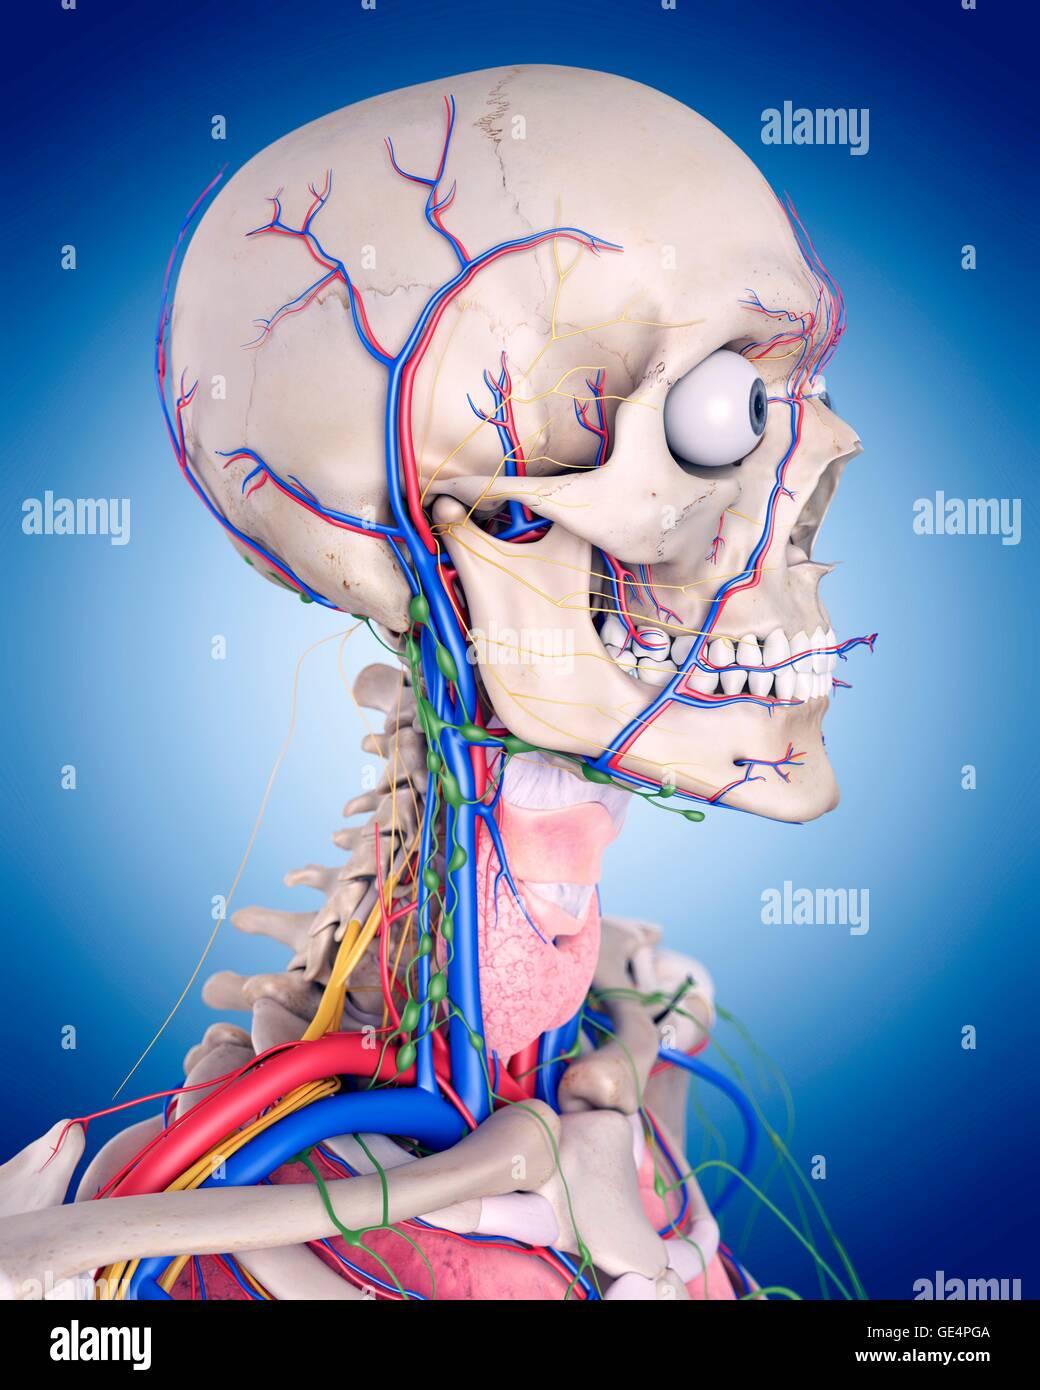 Head And Neck Arteries Stock Photos Head And Neck Arteries Stock